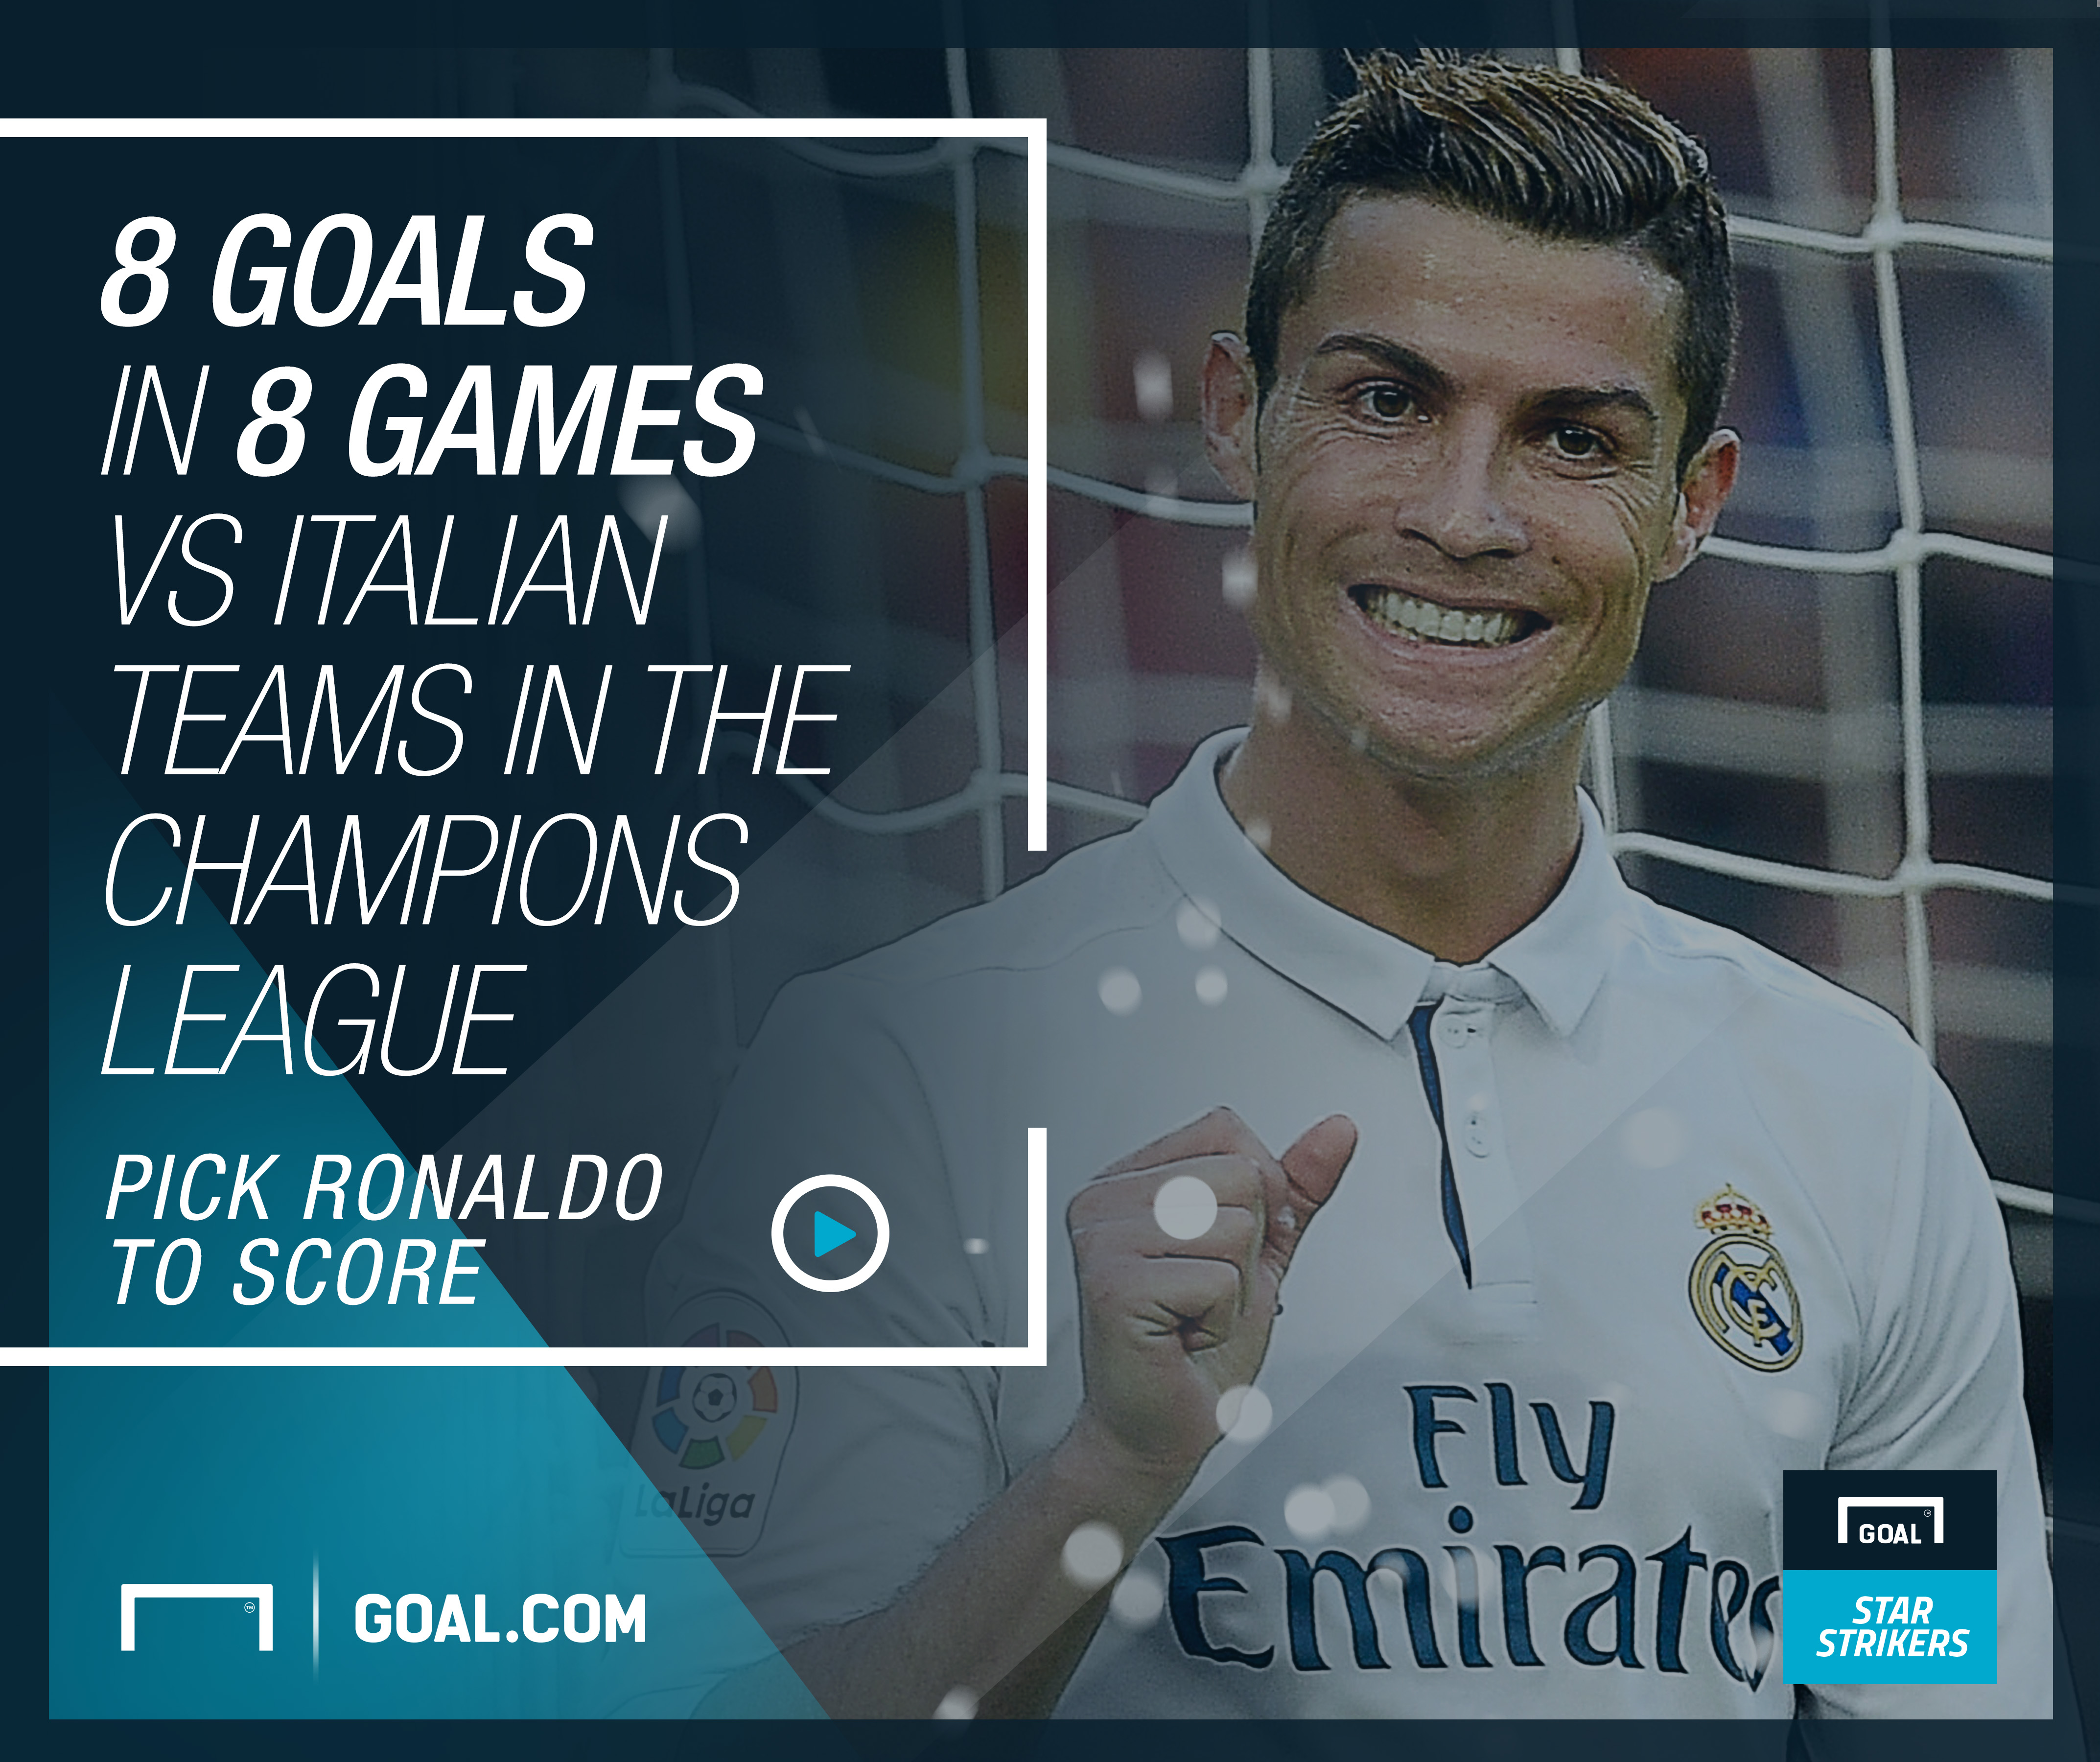 Goal Star Strikers - Ronaldo